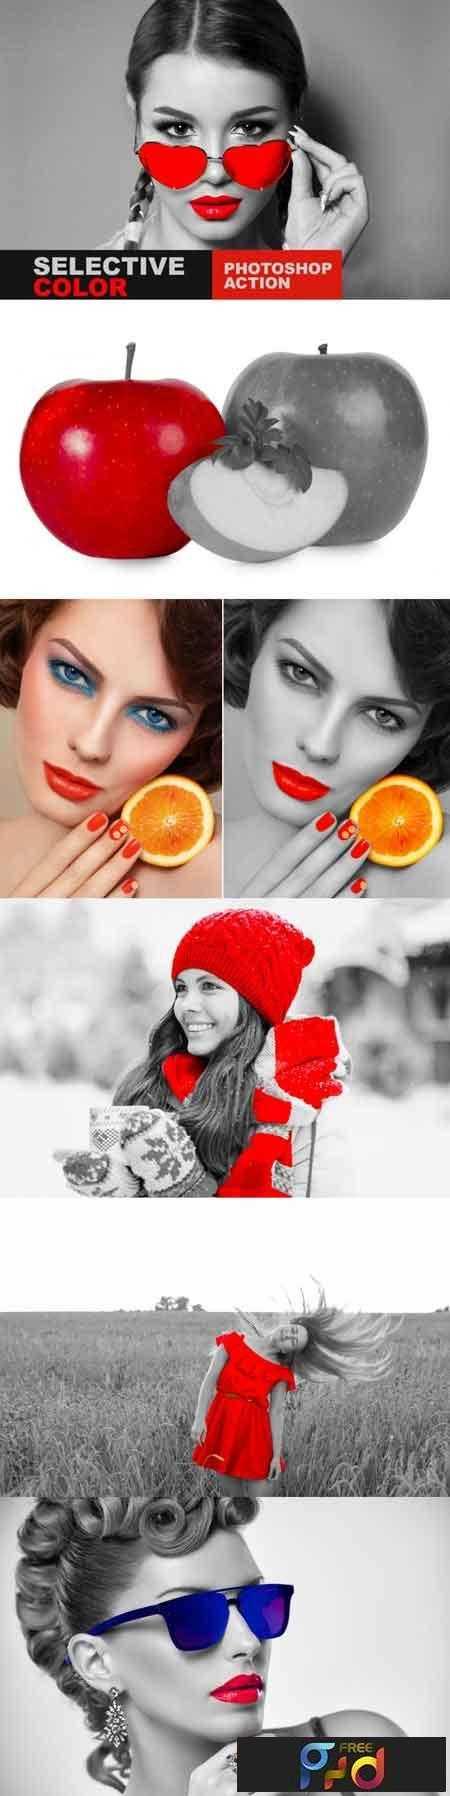 1808131 Selective Color Photoshop Action 3466289 1